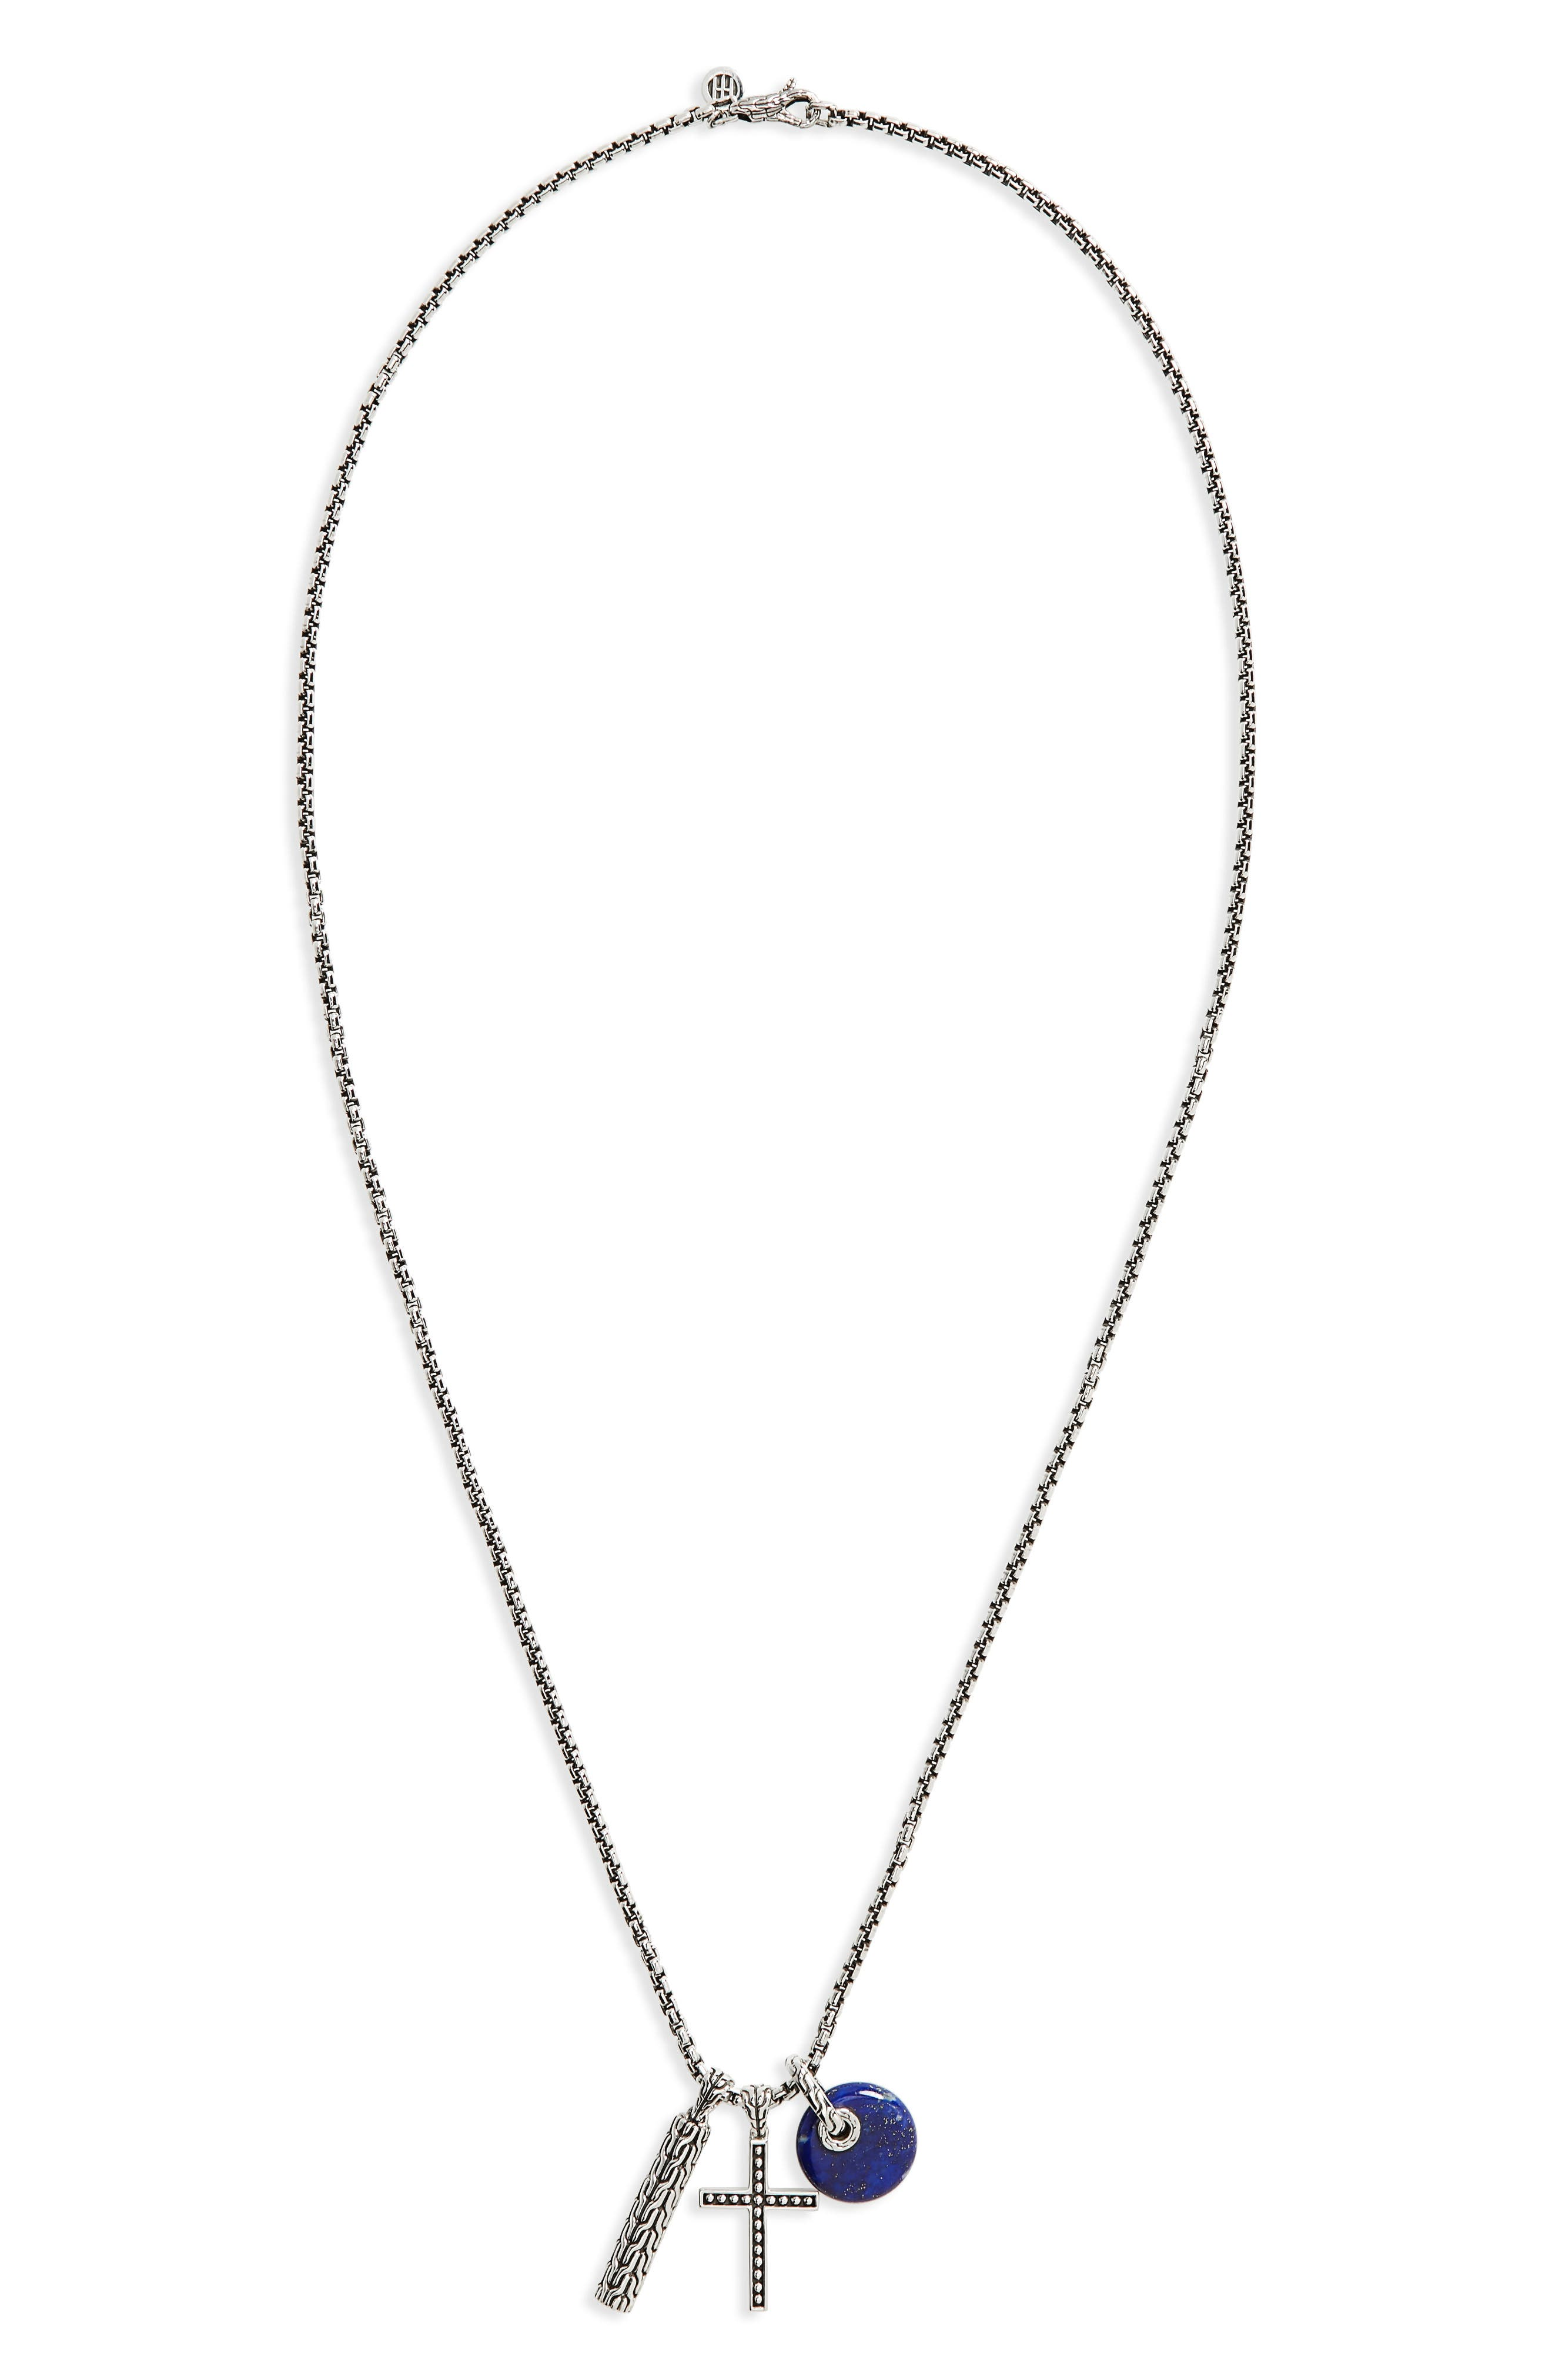 Jawan Charm Pendant Necklace,                             Main thumbnail 1, color,                             SILVER/ LAPIS LAZULI